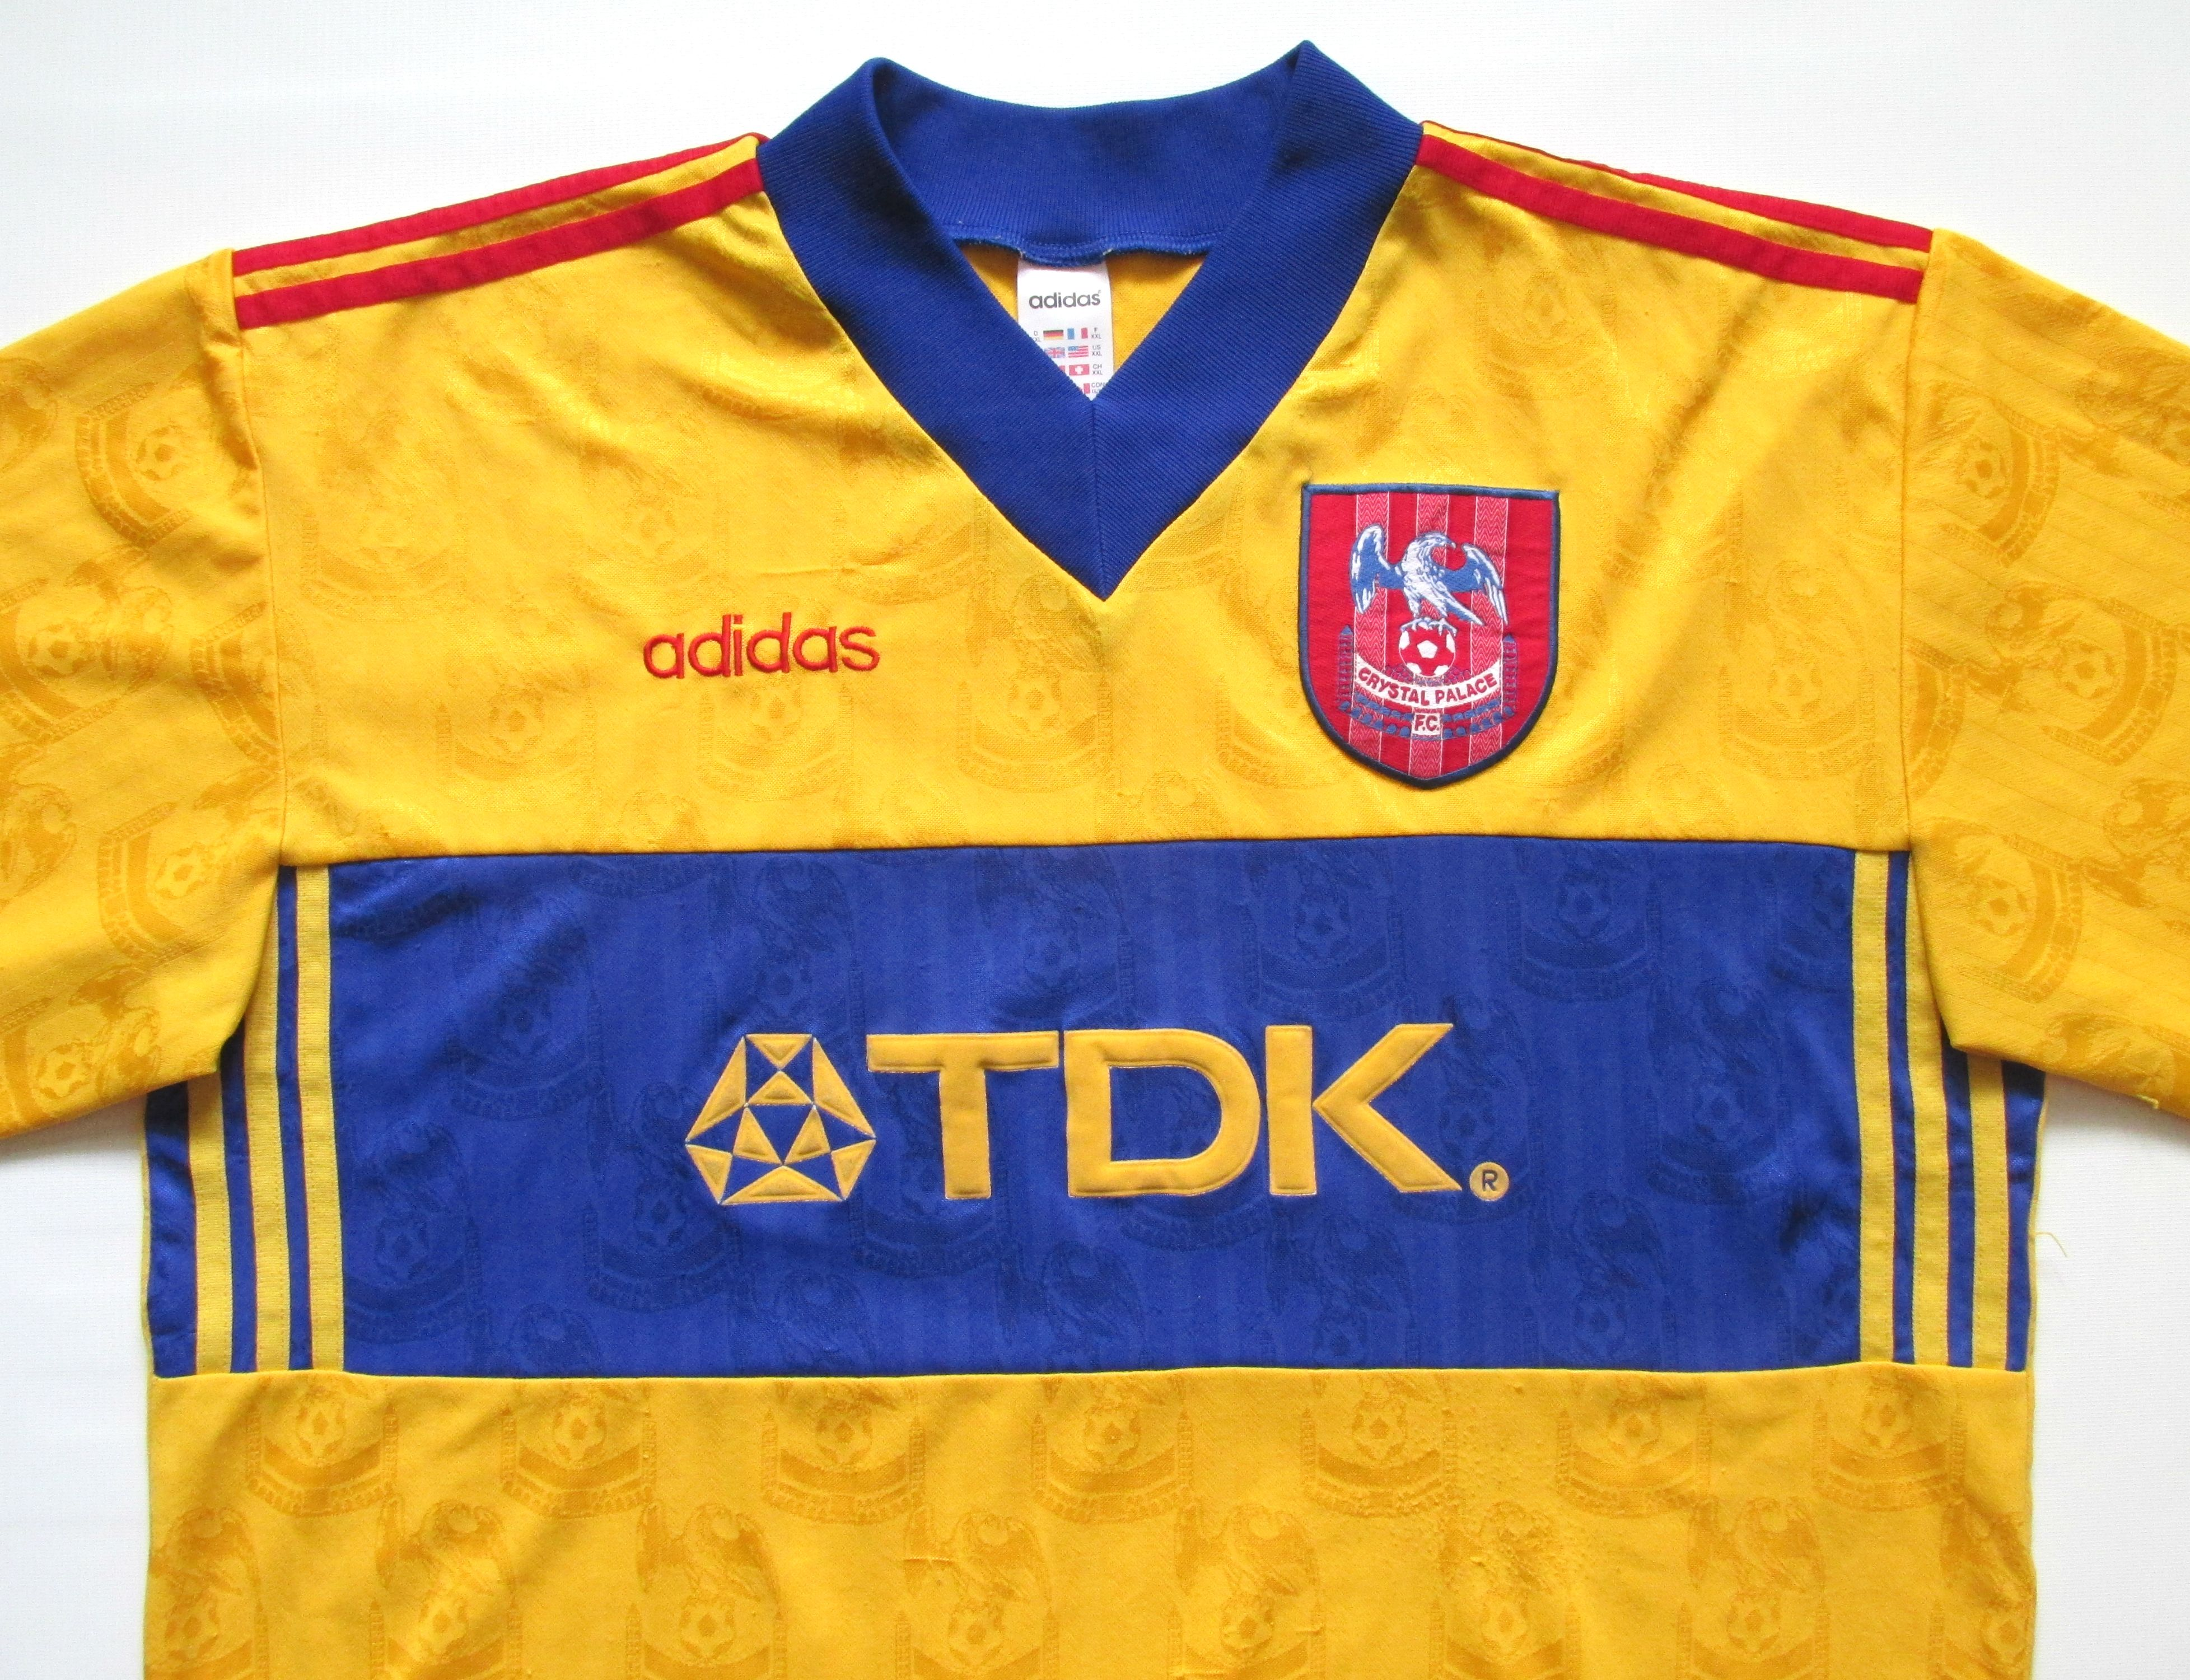 semiconductor novato orificio de soplado  Crystal Palace 1997/1998 away football shirt by Adidas #Palace  #CrystalPalace #CPFC#adidas #so… | Football jersey shirt, Vintage football  shirts, Football shirts